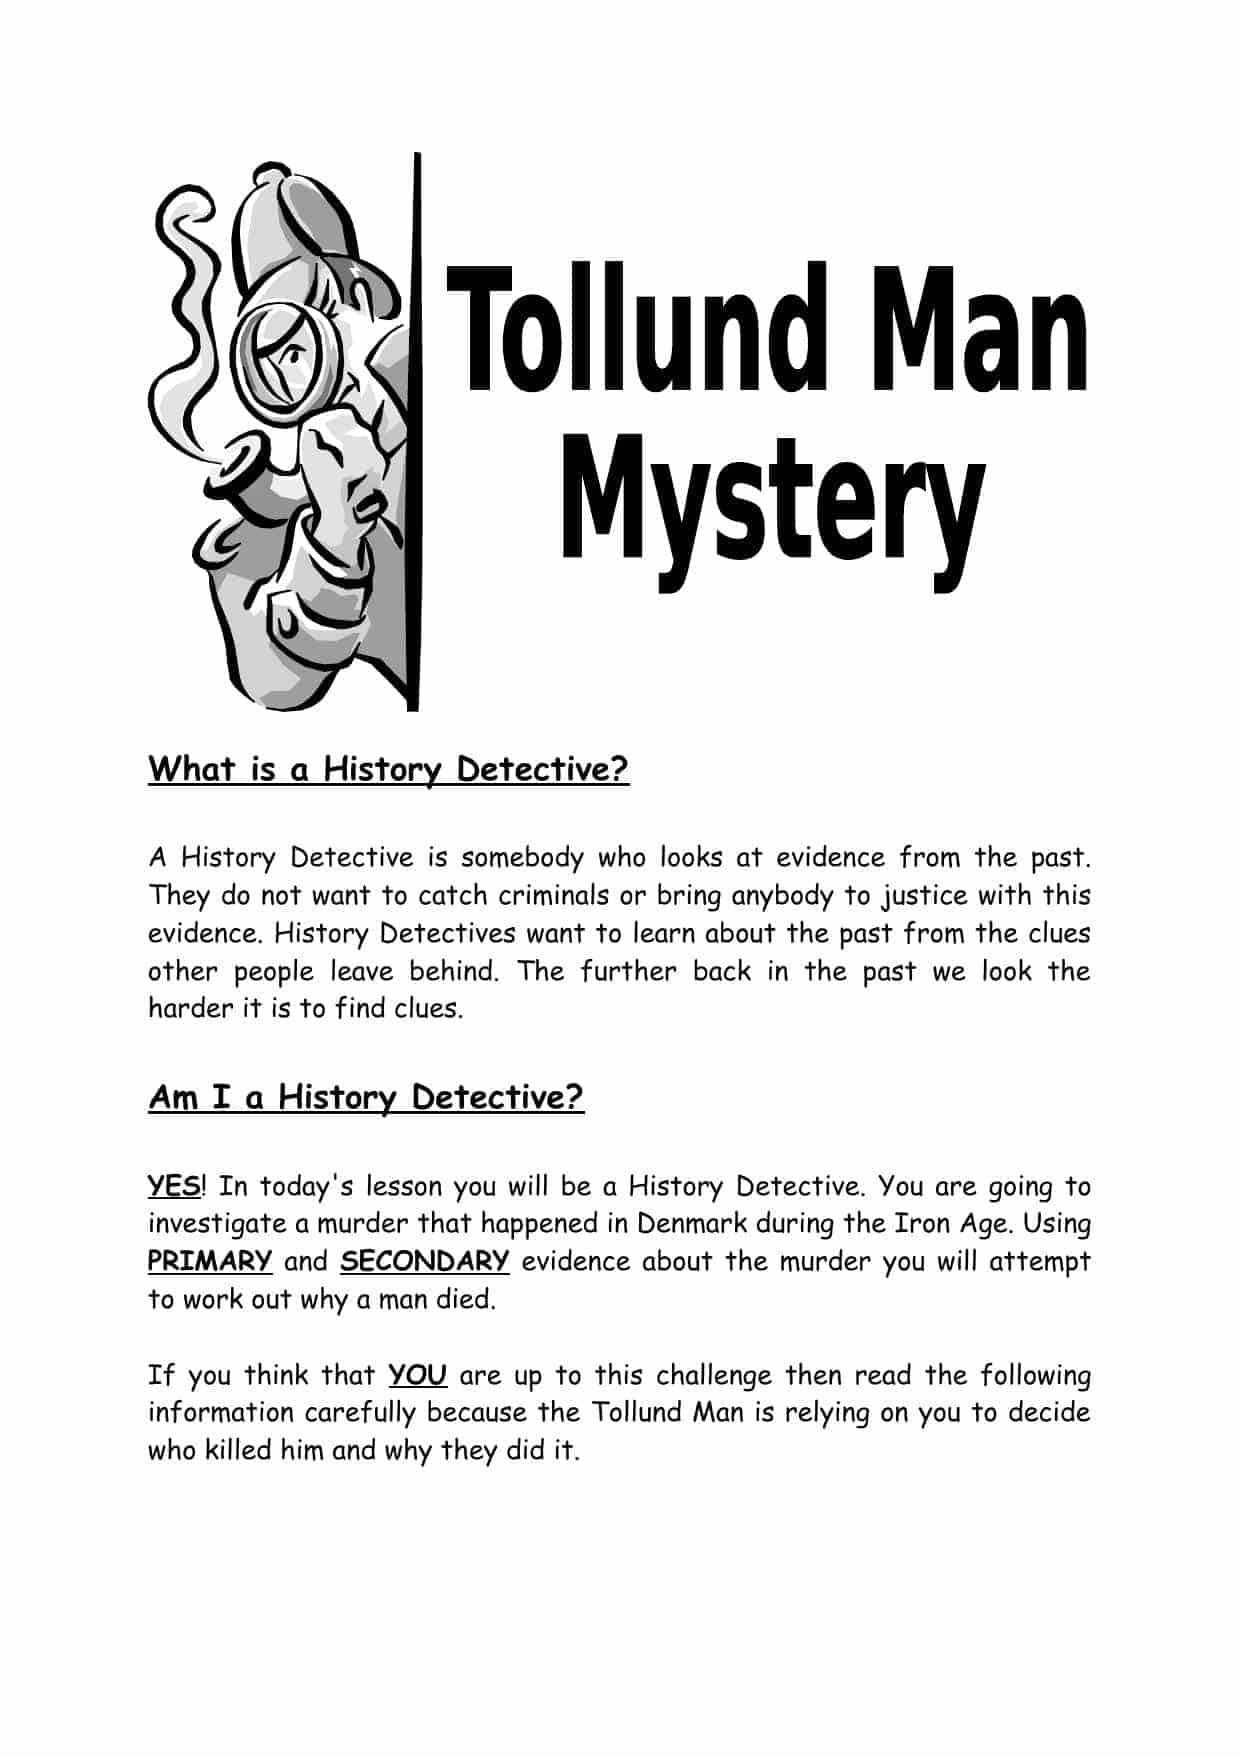 Tollund Man History Detective Worksheet